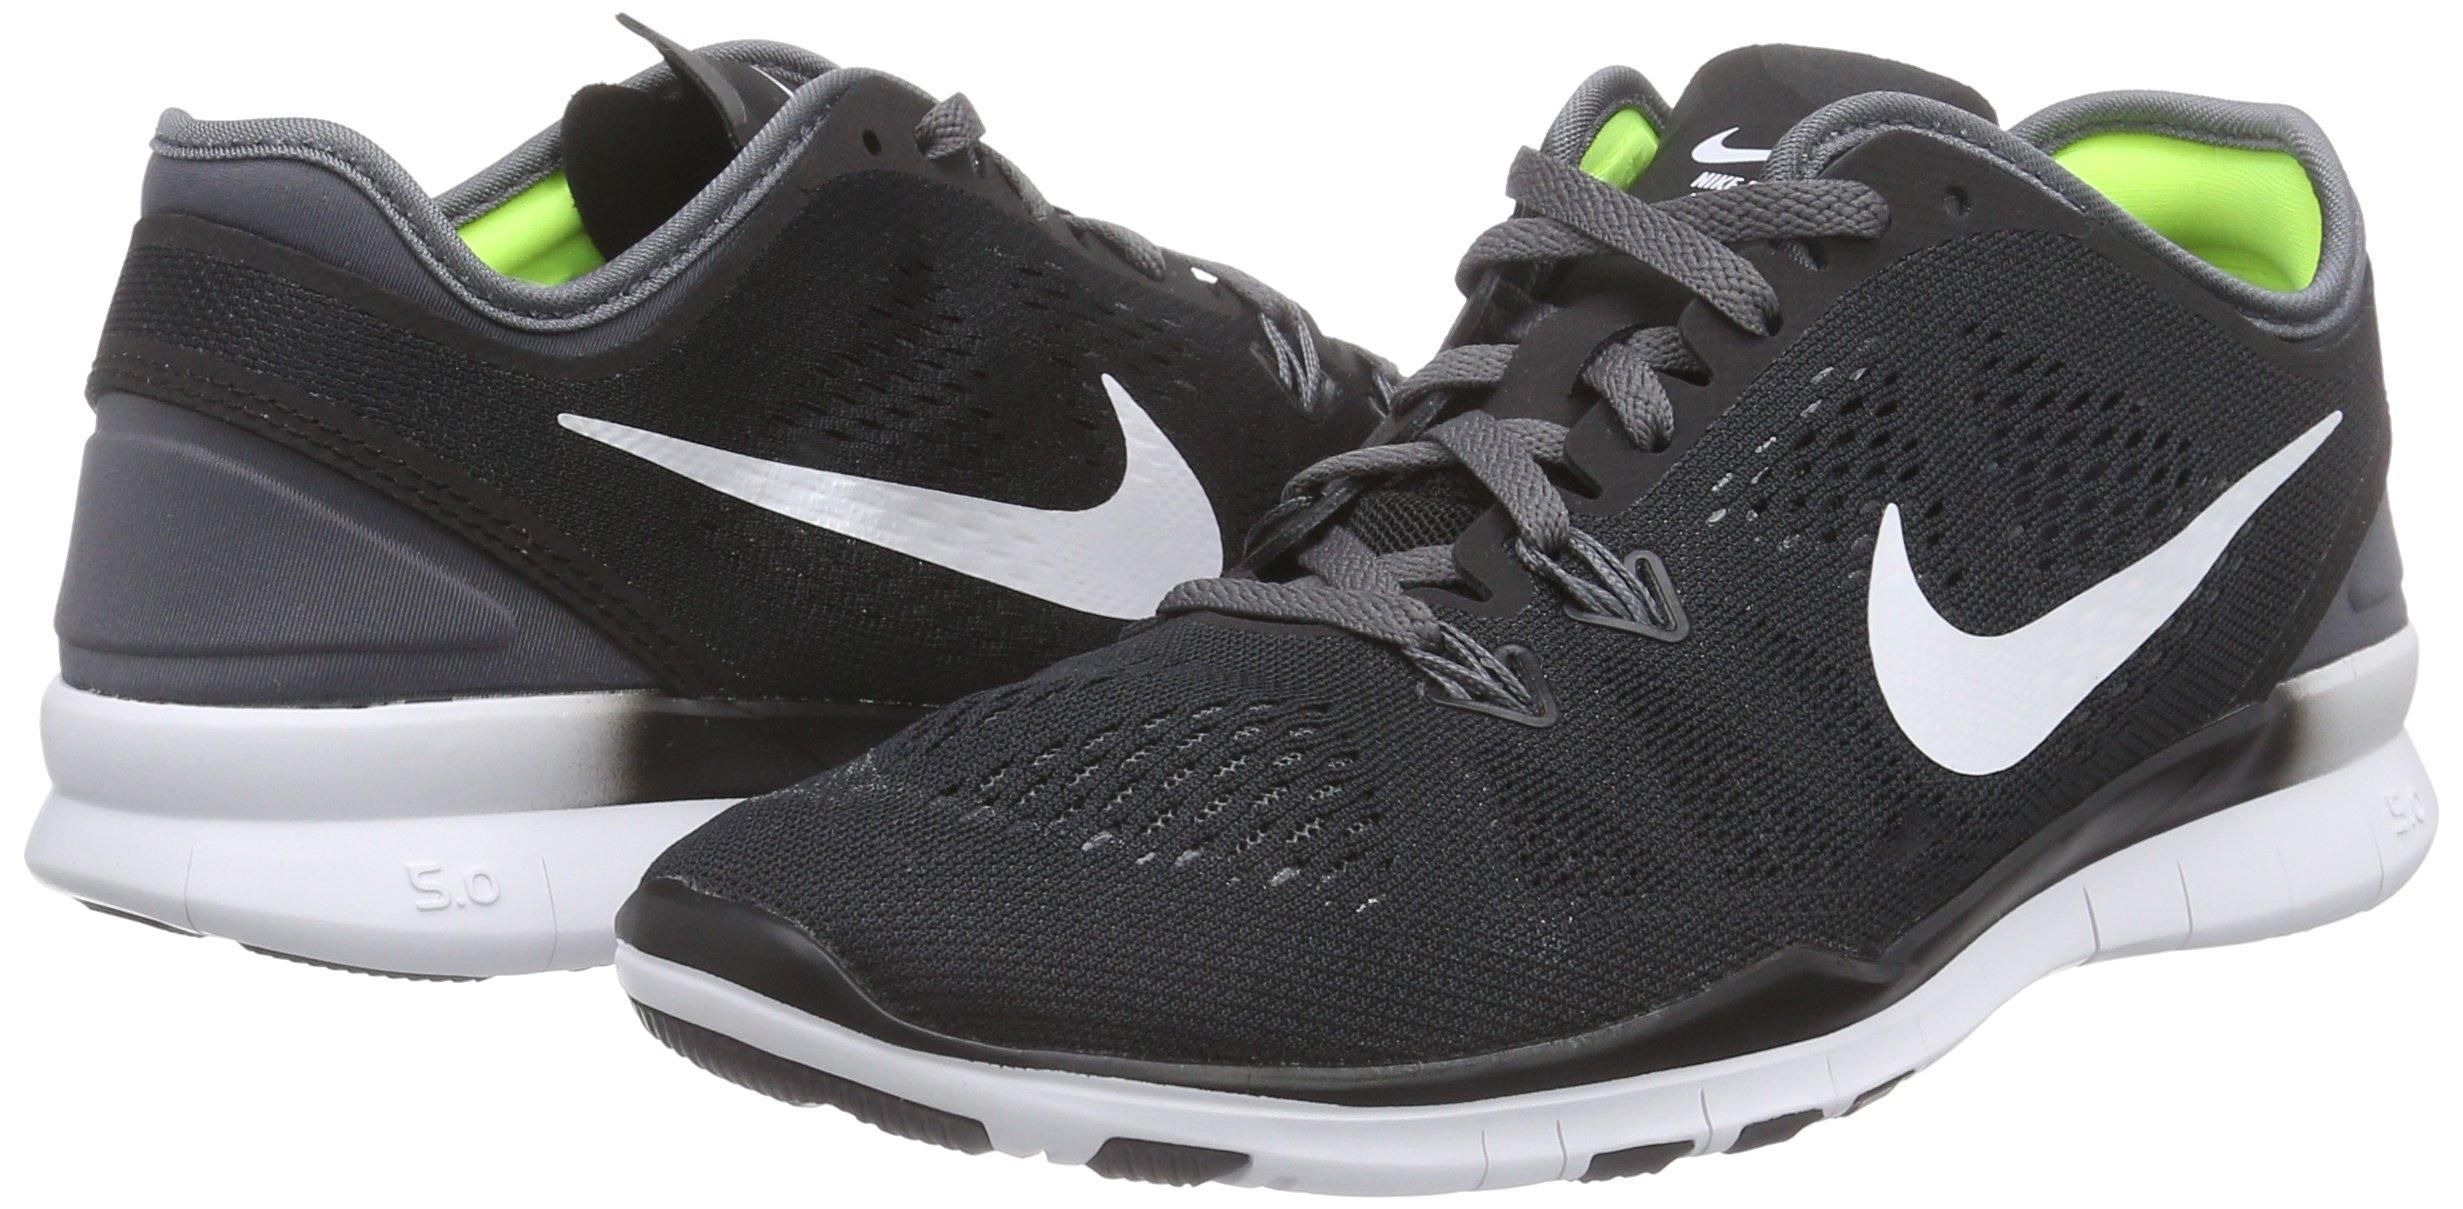 Nike Womens Free 5.0 Tr Fit 5 Black/White/Dark Grey/White Training Shoe 5 Women US by Nike (Image #5)